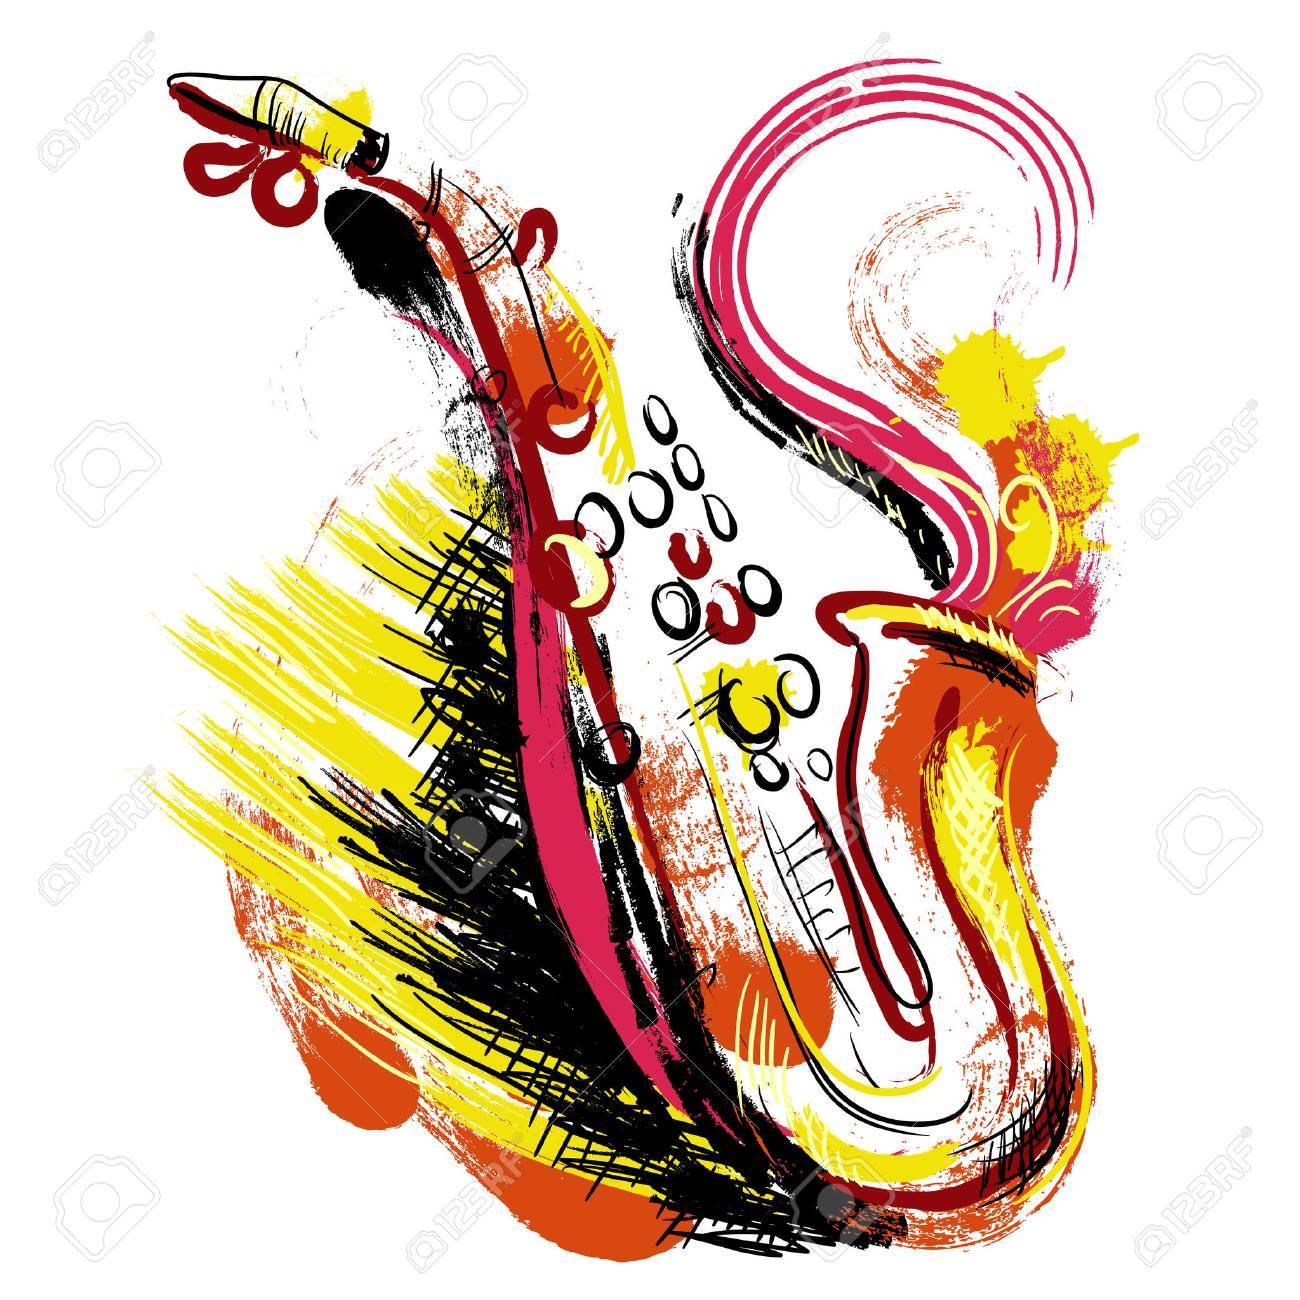 Saxophone. Hand drawn grunge style art. Colorful retro vector illustration. Banner, card, scrap booking, t-shirt, bag, print, poster. - 55587477